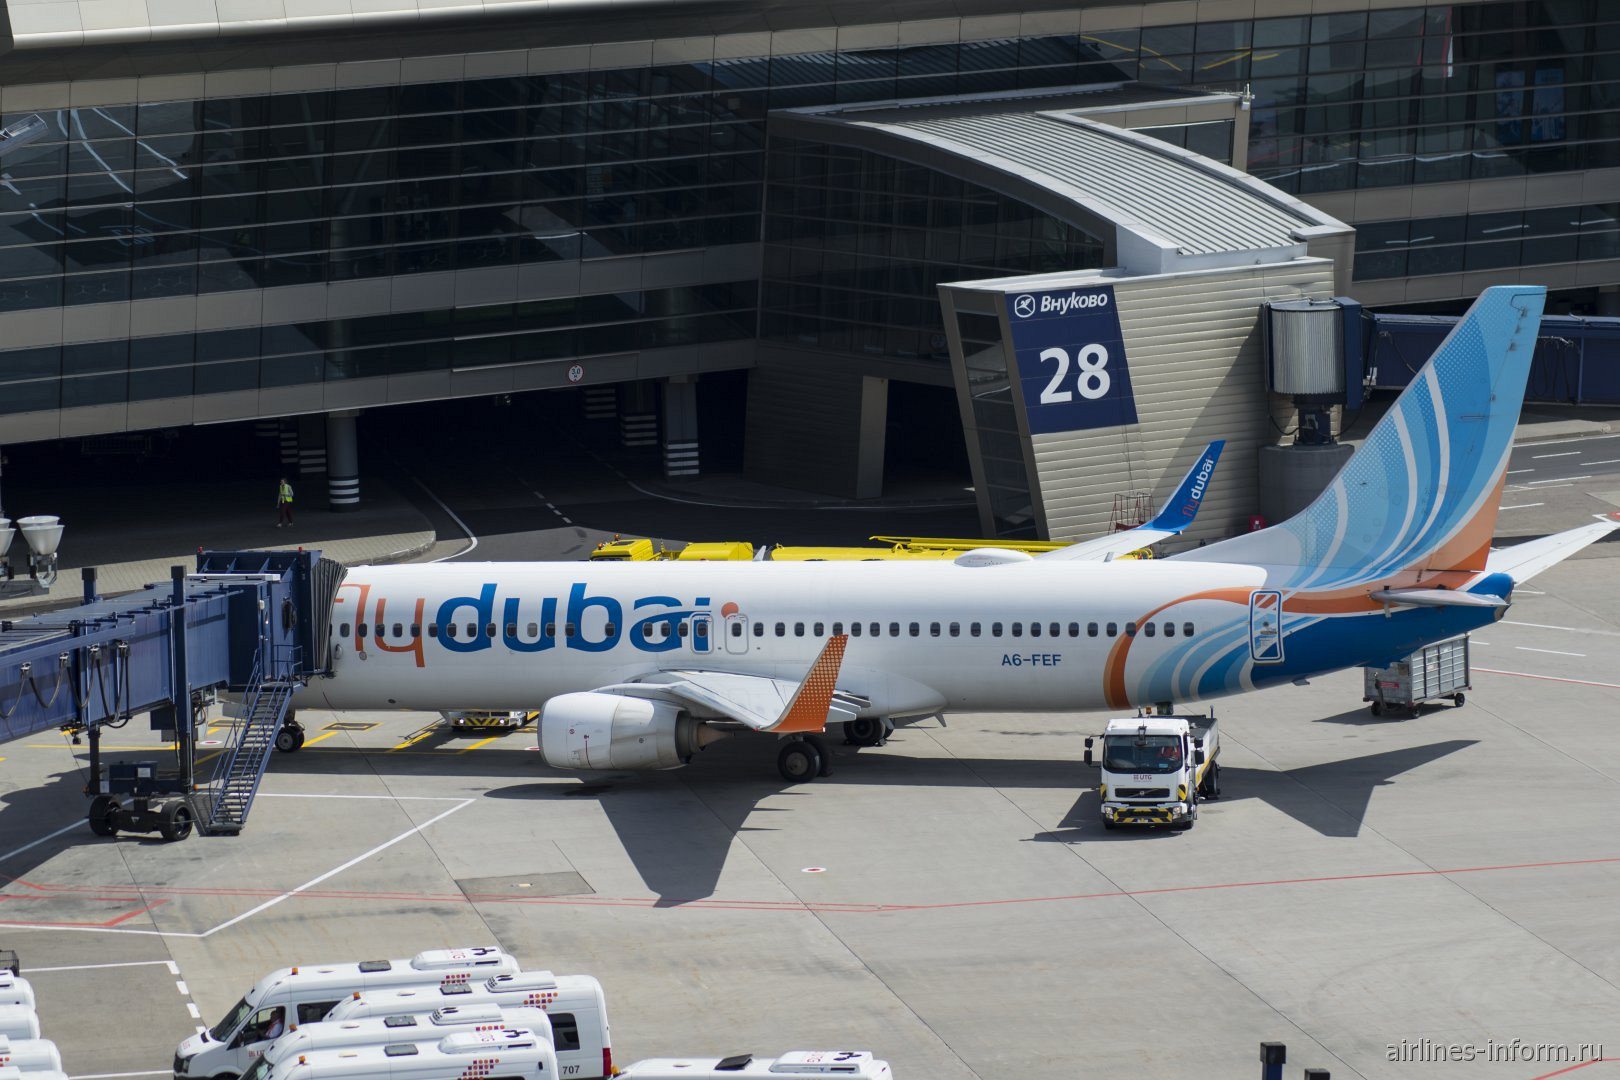 Боинг-737-800 A6-FEF авиакомпании Flydubai у телетрапа в аэропорту Внуково